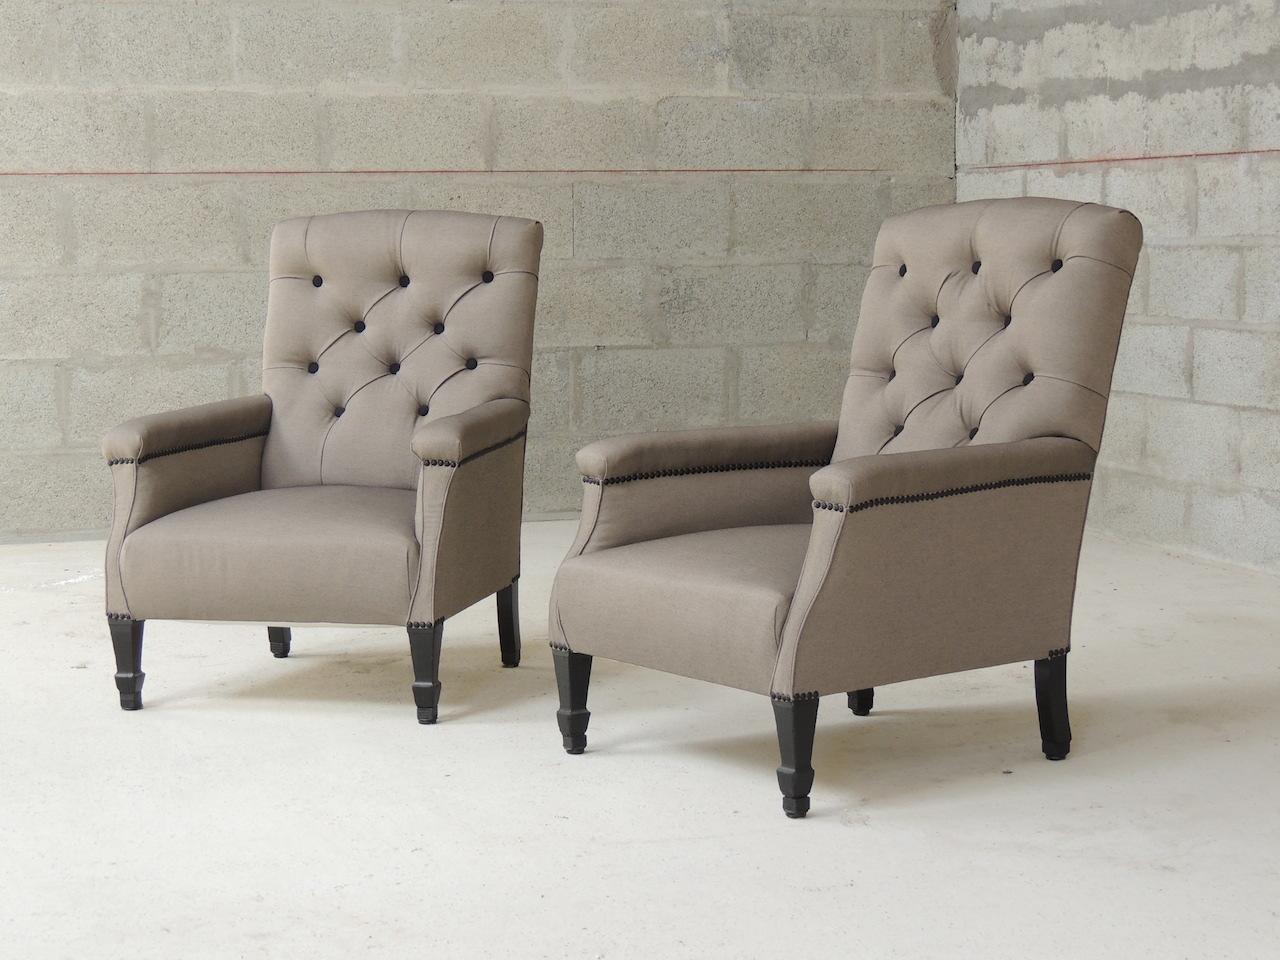 fauteuil anglais vanessa camisuli. Black Bedroom Furniture Sets. Home Design Ideas